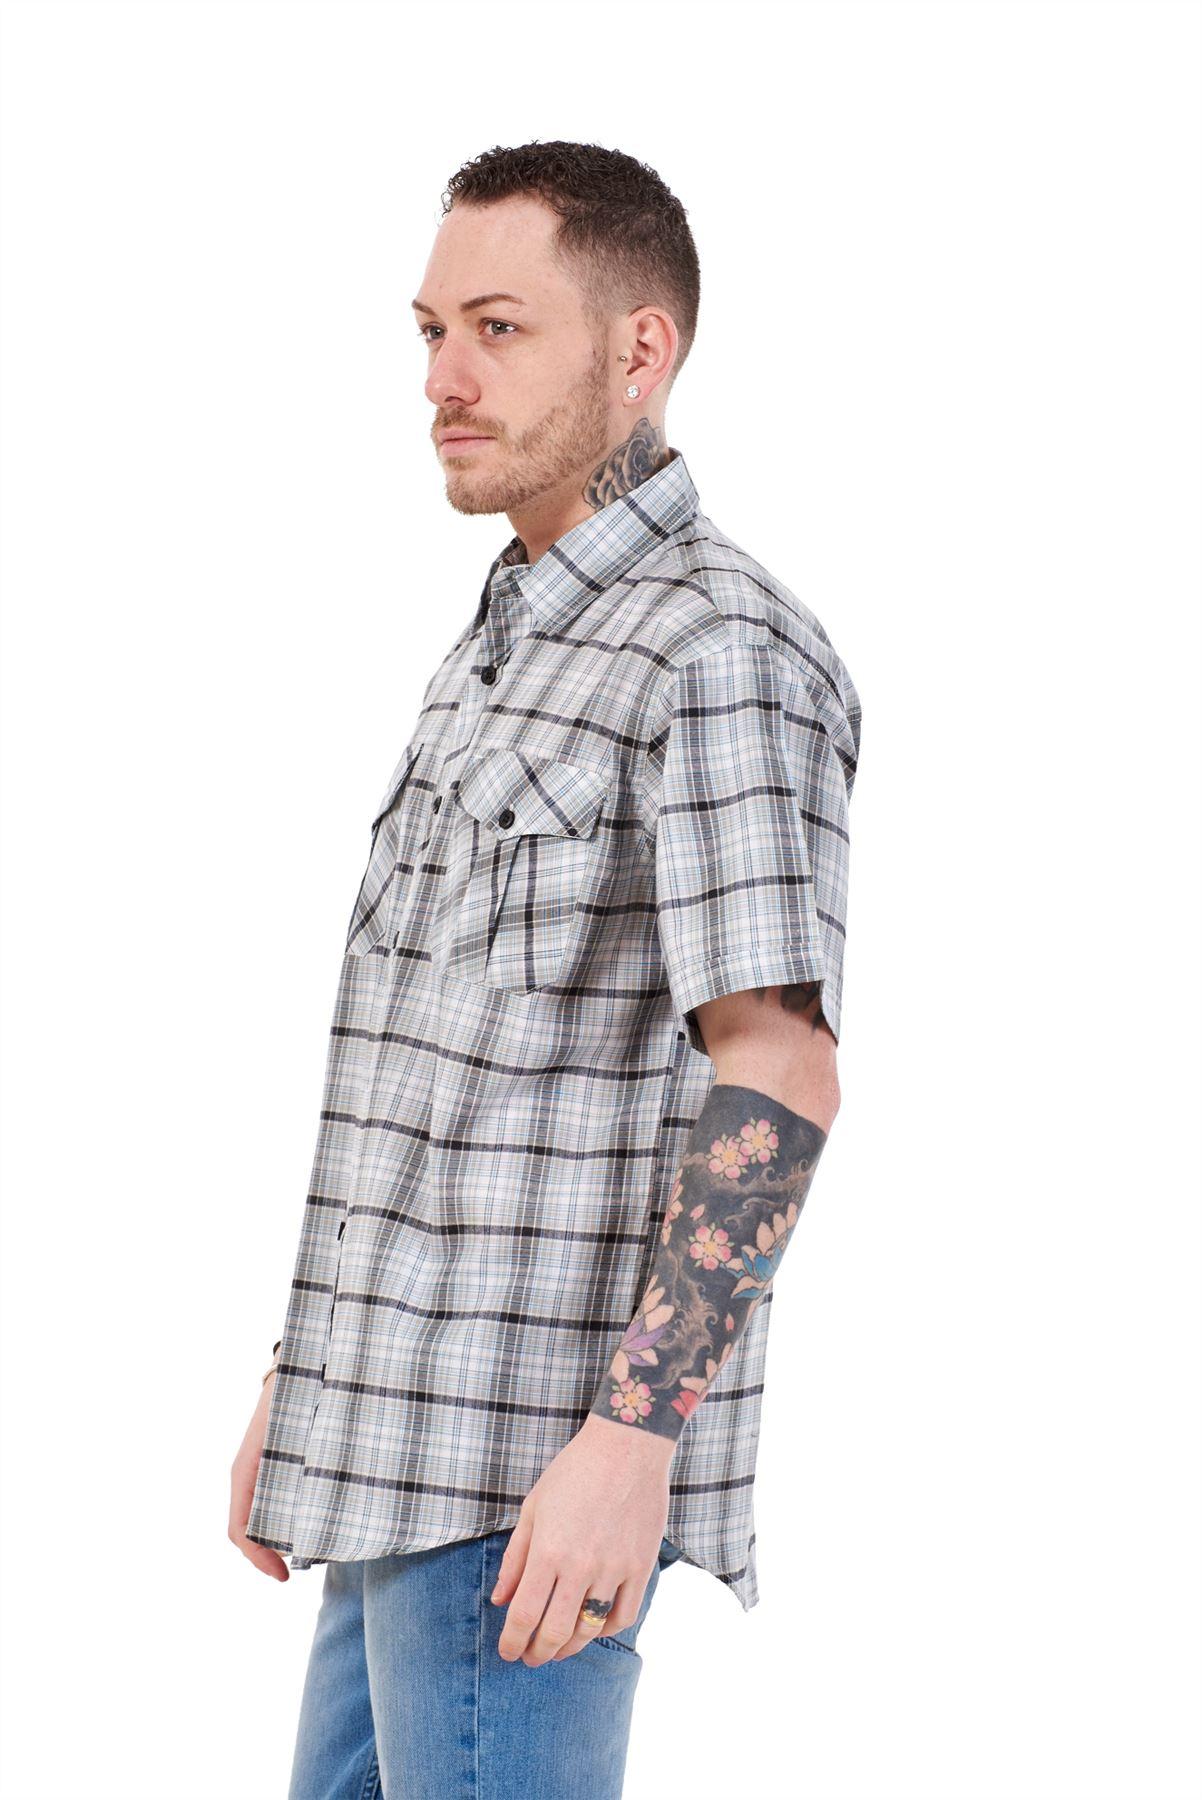 Mens-Regular-Big-Size-Shirts-Checked-Cotton-Blend-Casual-Short-Sleeve-Blue-M-5XL thumbnail 21